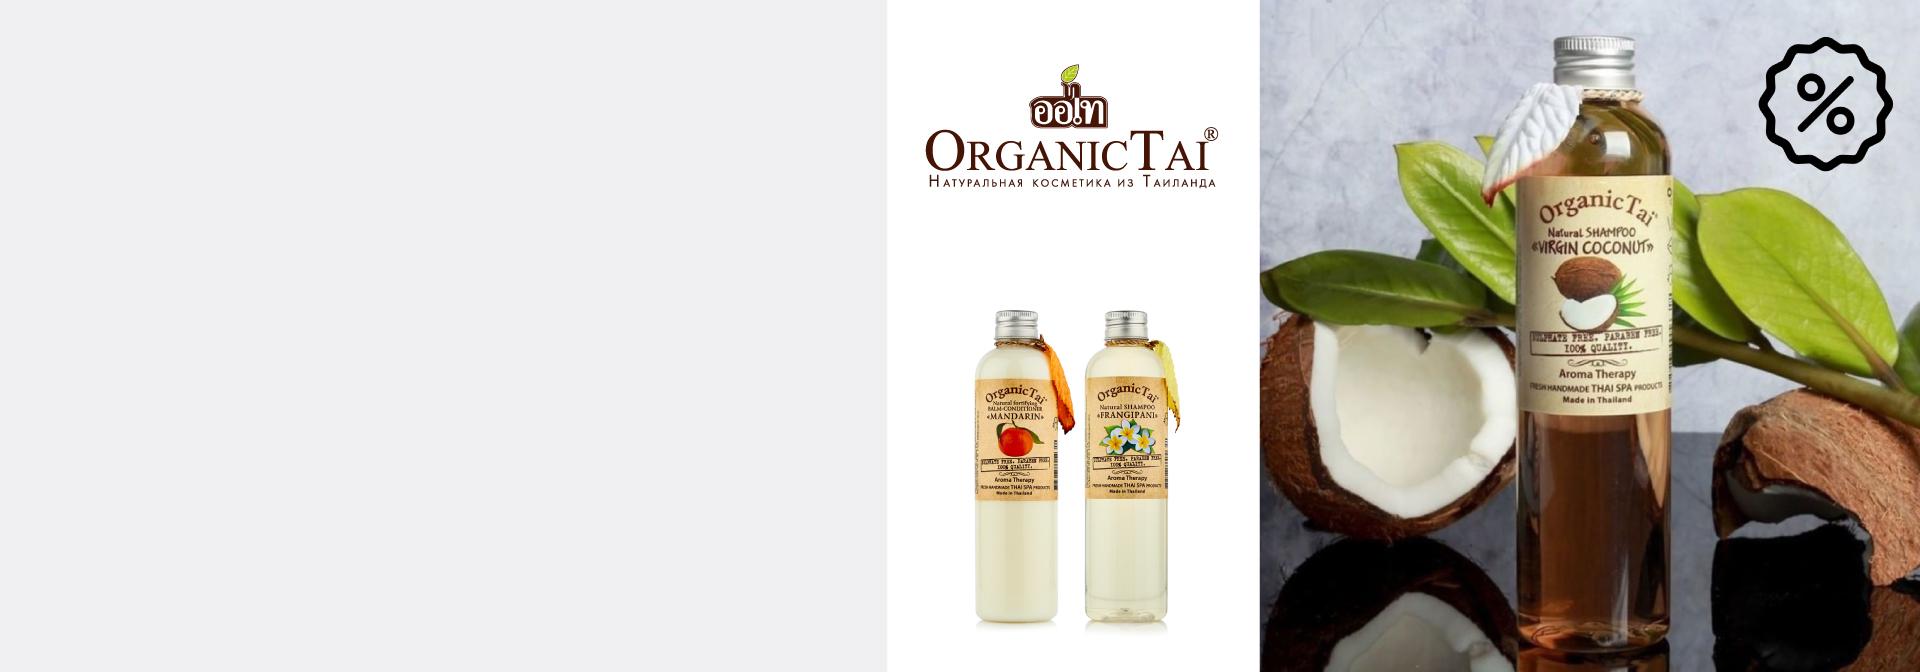 Распродажа OrganicTai